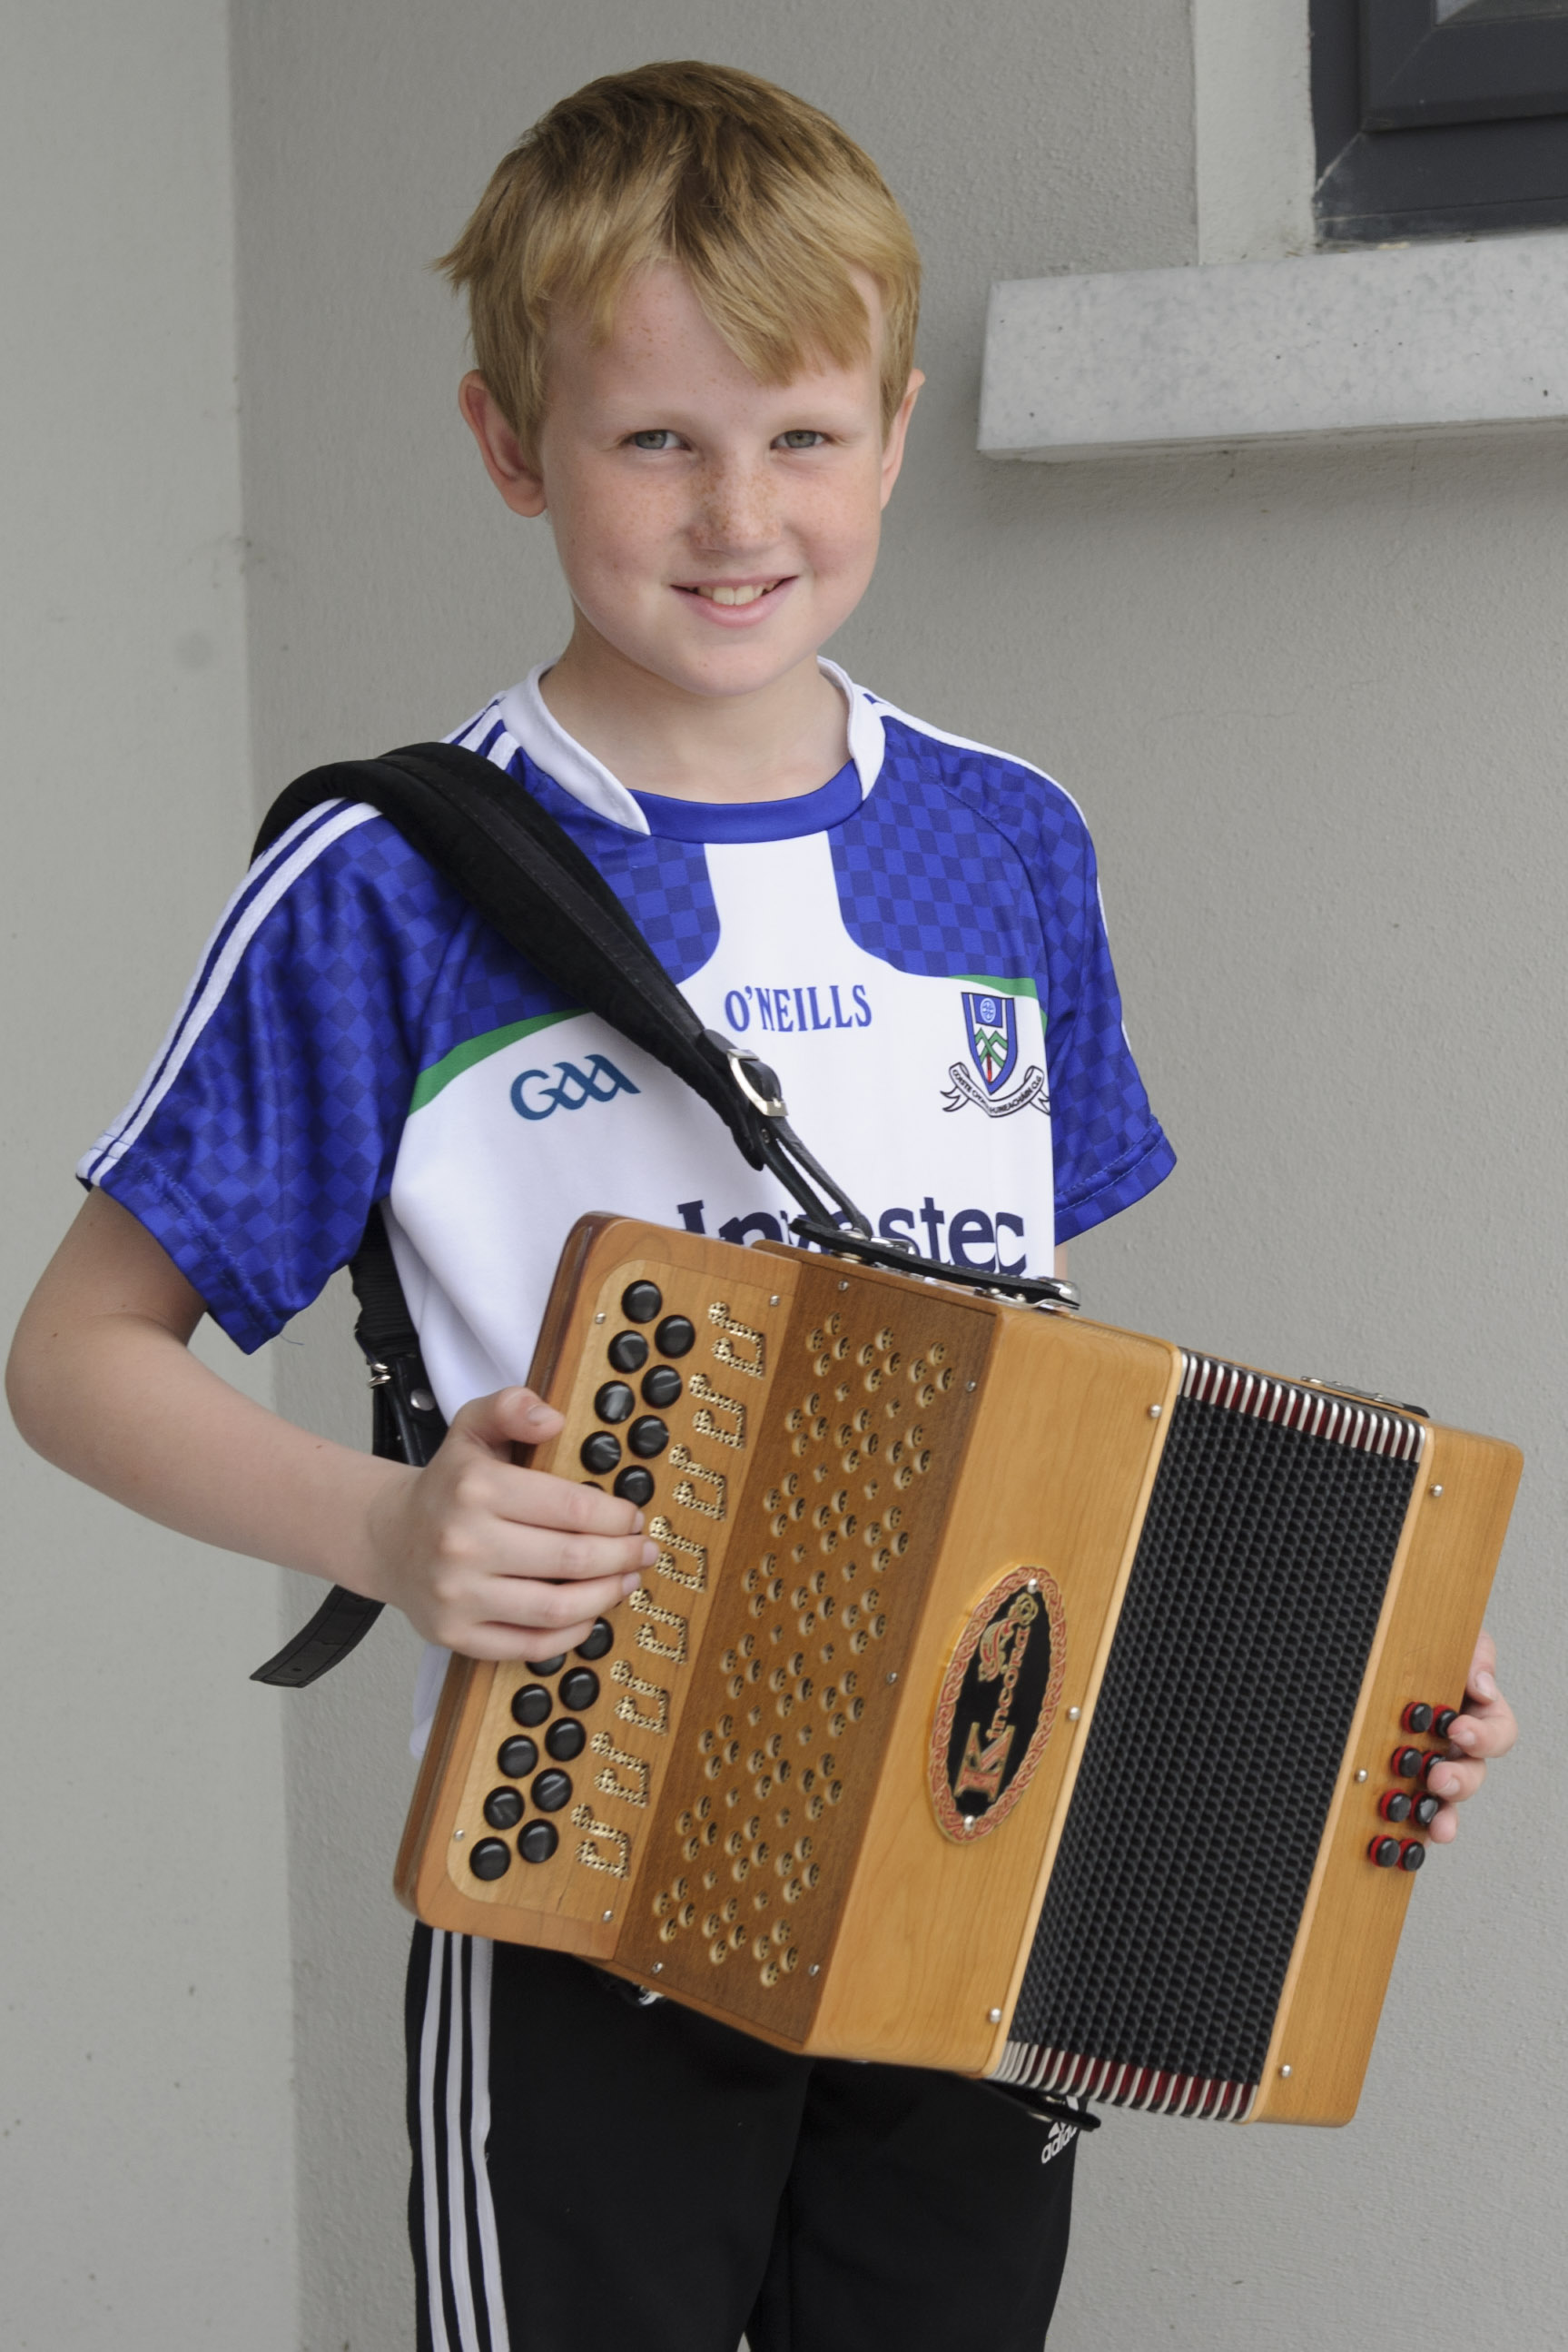 Fionán Ó Gallghóir, Baile Mhuineacháin CCE, who was the winner of the U-12 Button Accordian. ©Rory Geary/The Northern Standard